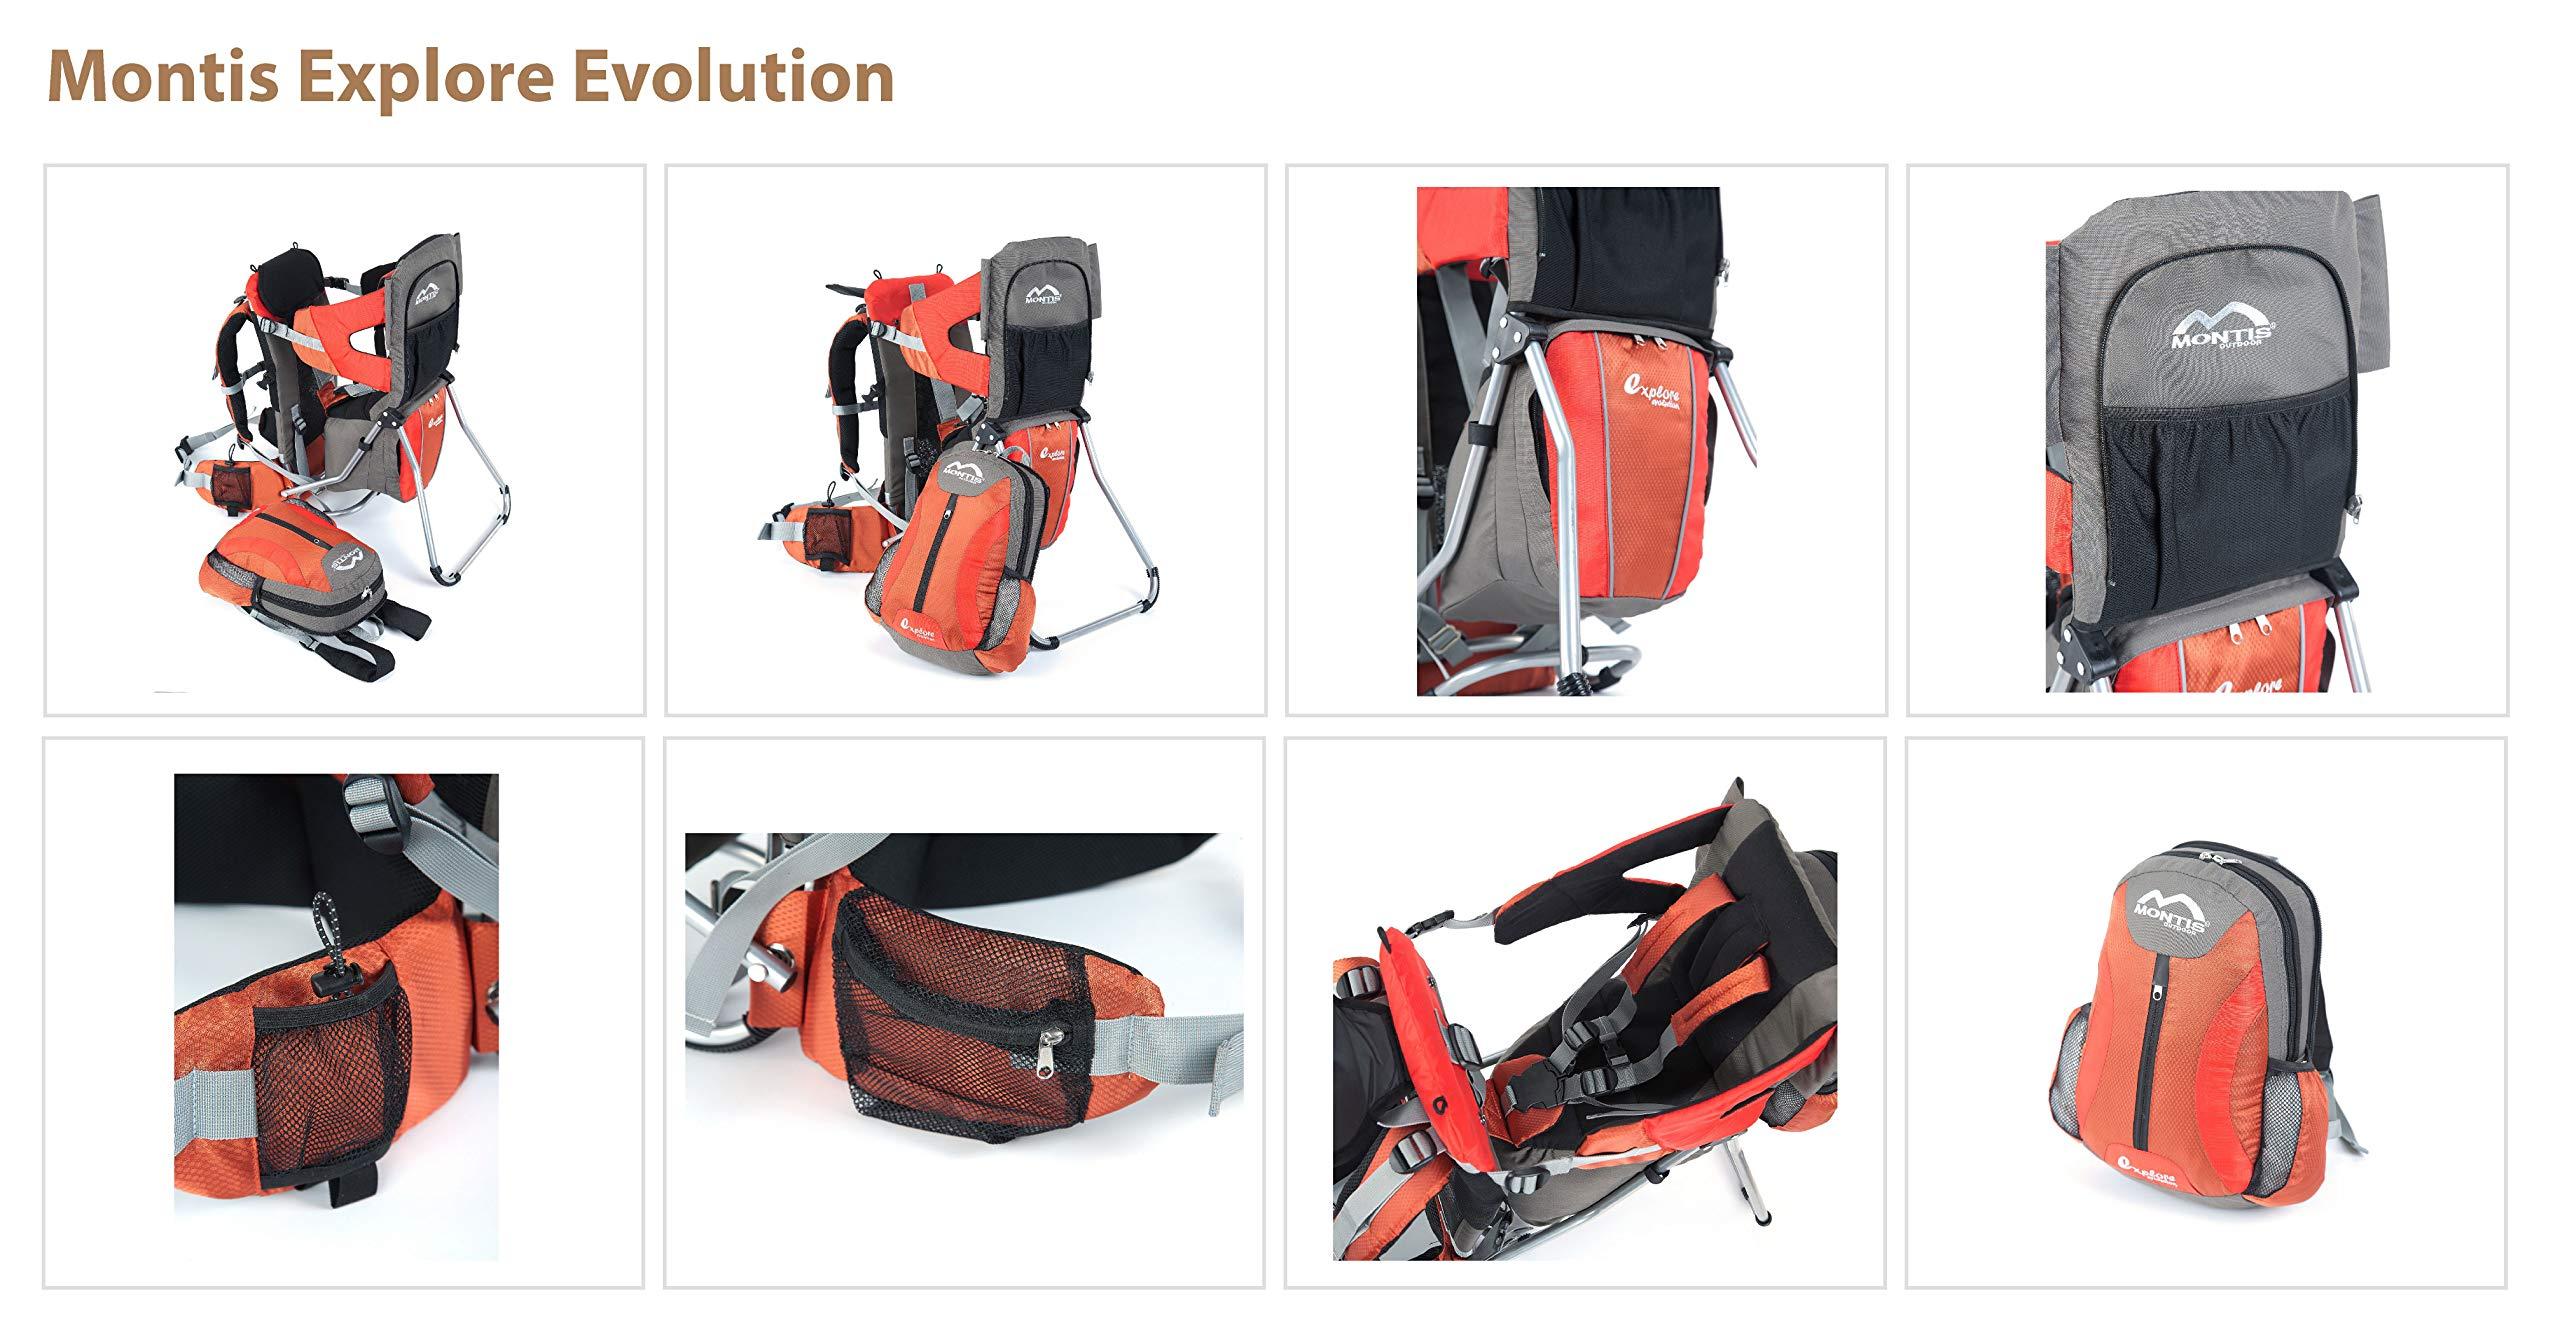 81kiNjbRSIL - Montis Explore Evolution - Mochila portabebés (Carga máxima de 25 kg), Color Naranja y Rojo (2000 gr)